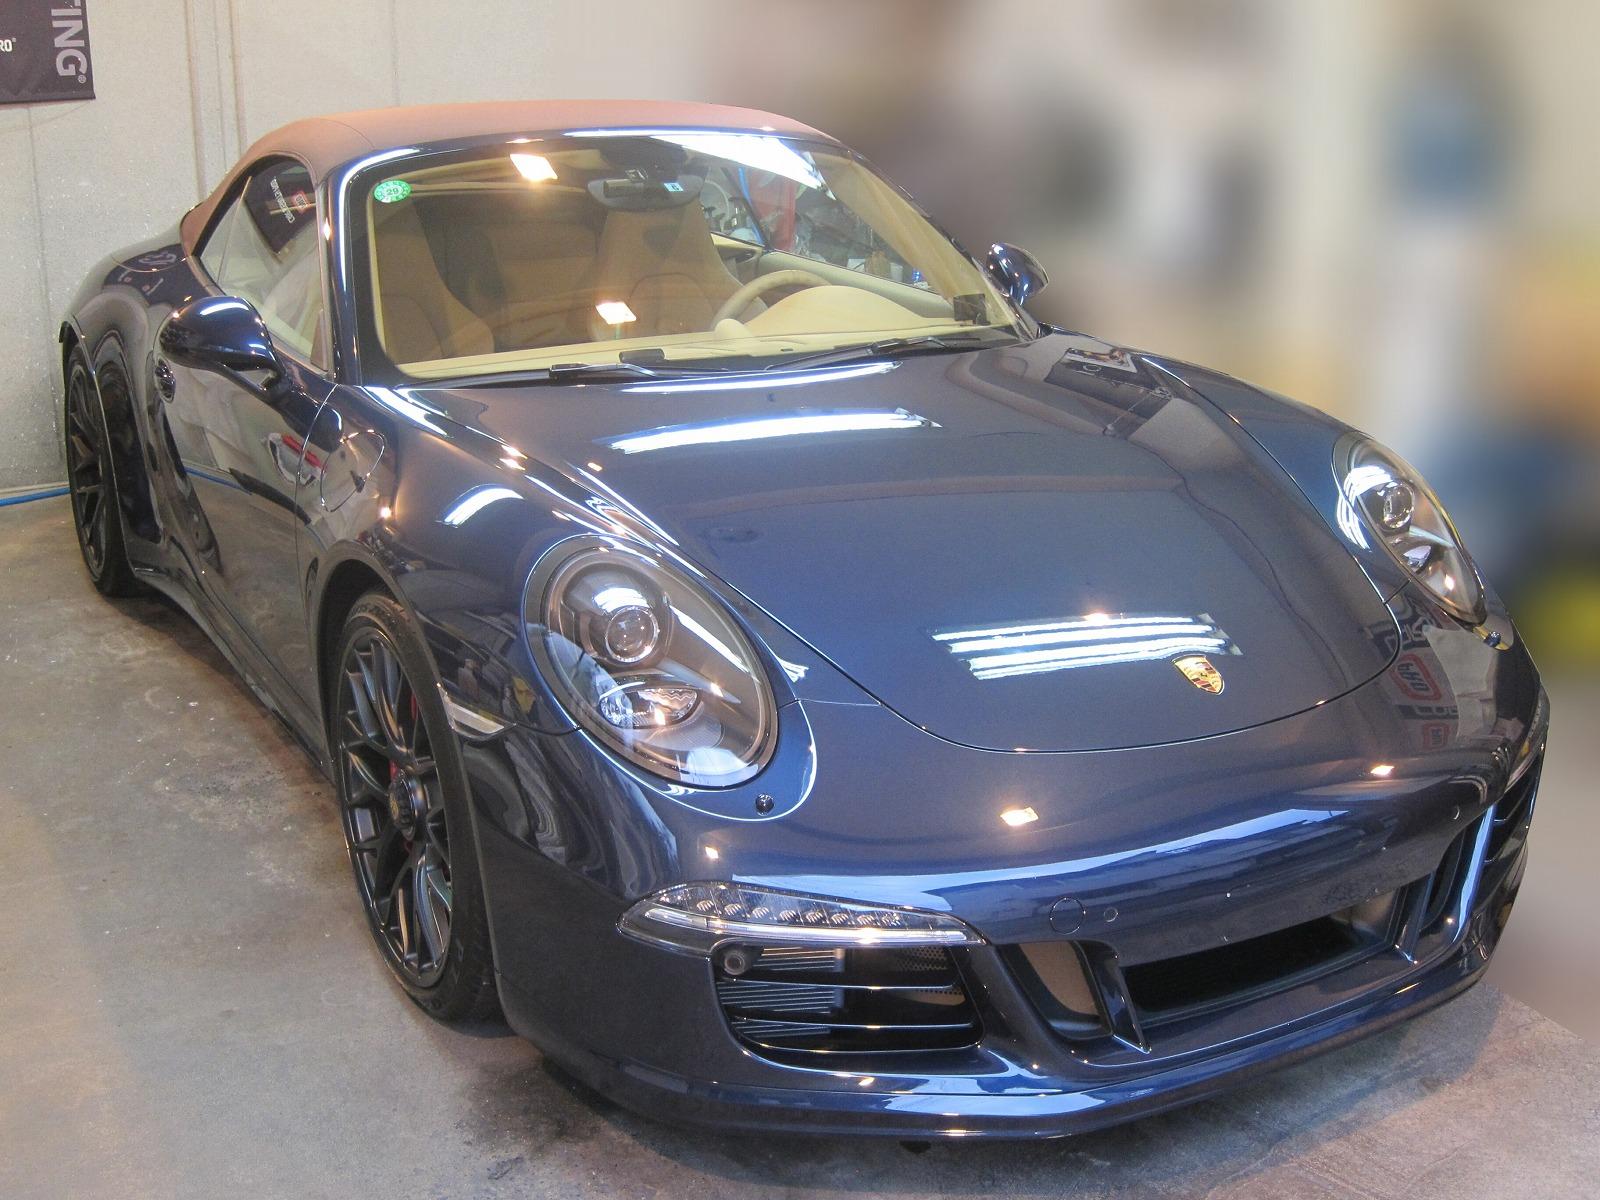 20161108-porsche-911-carrera-gts-01